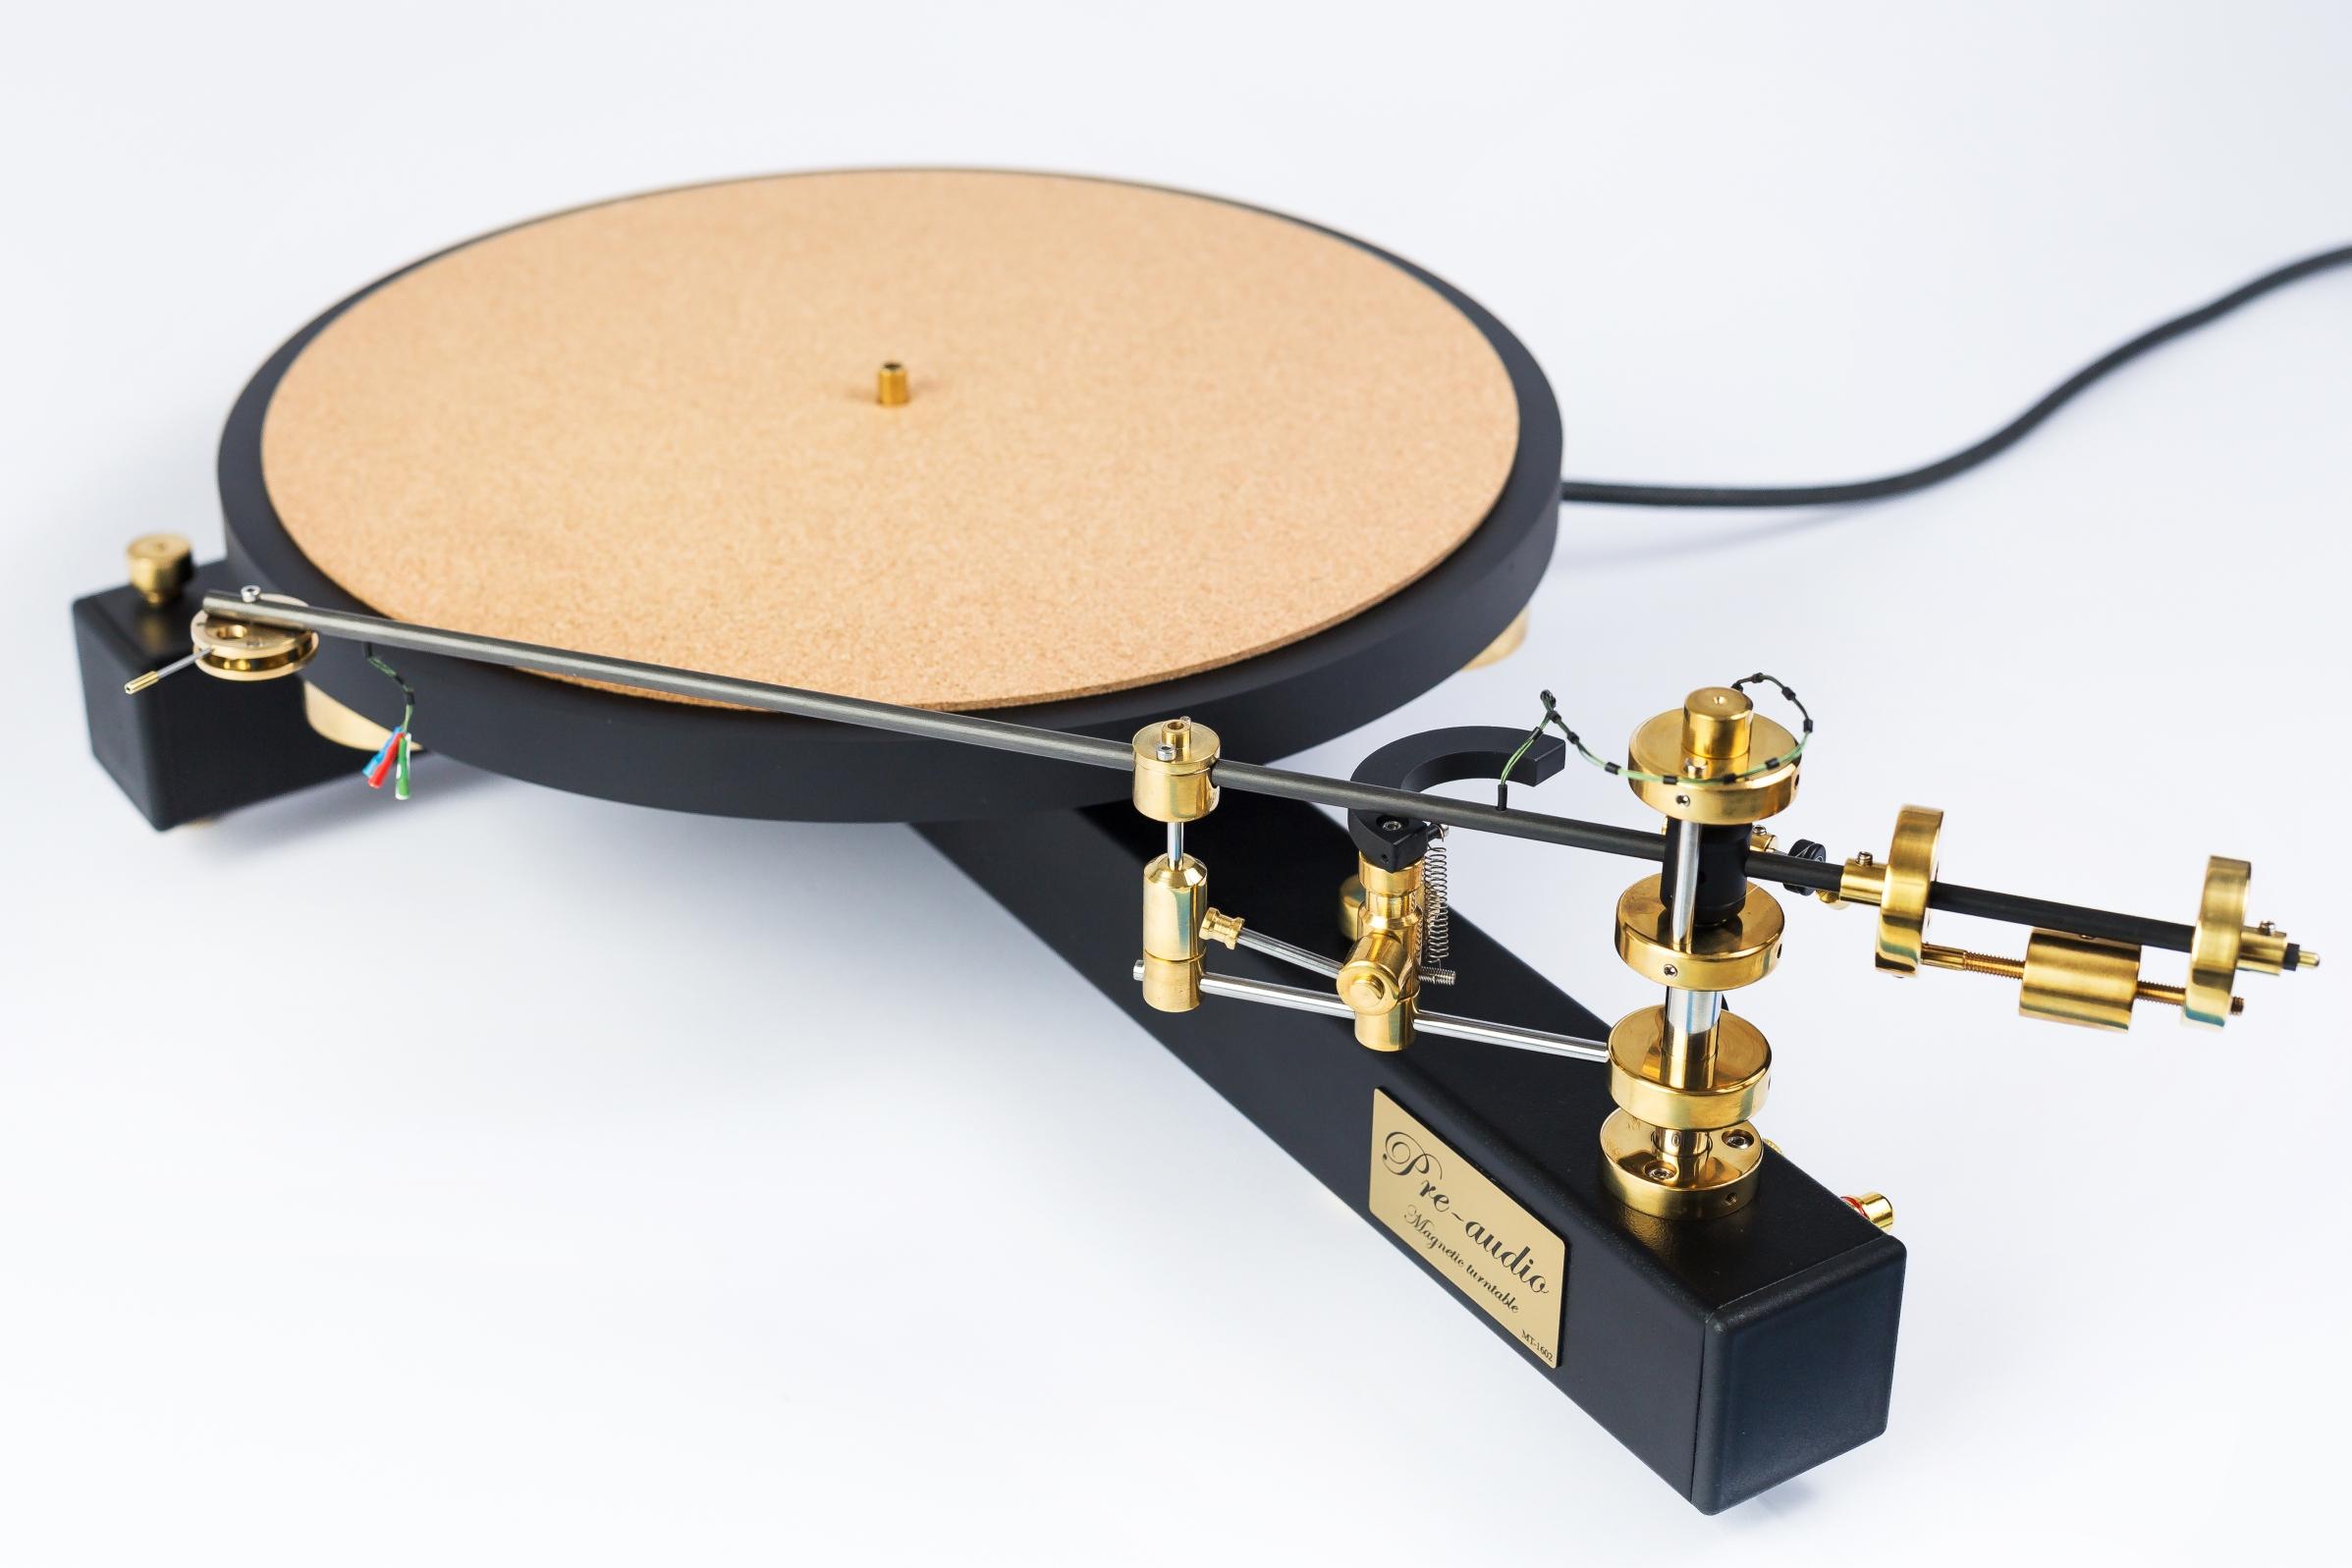 MT-1602 Turntable, Magnetic Tonearm